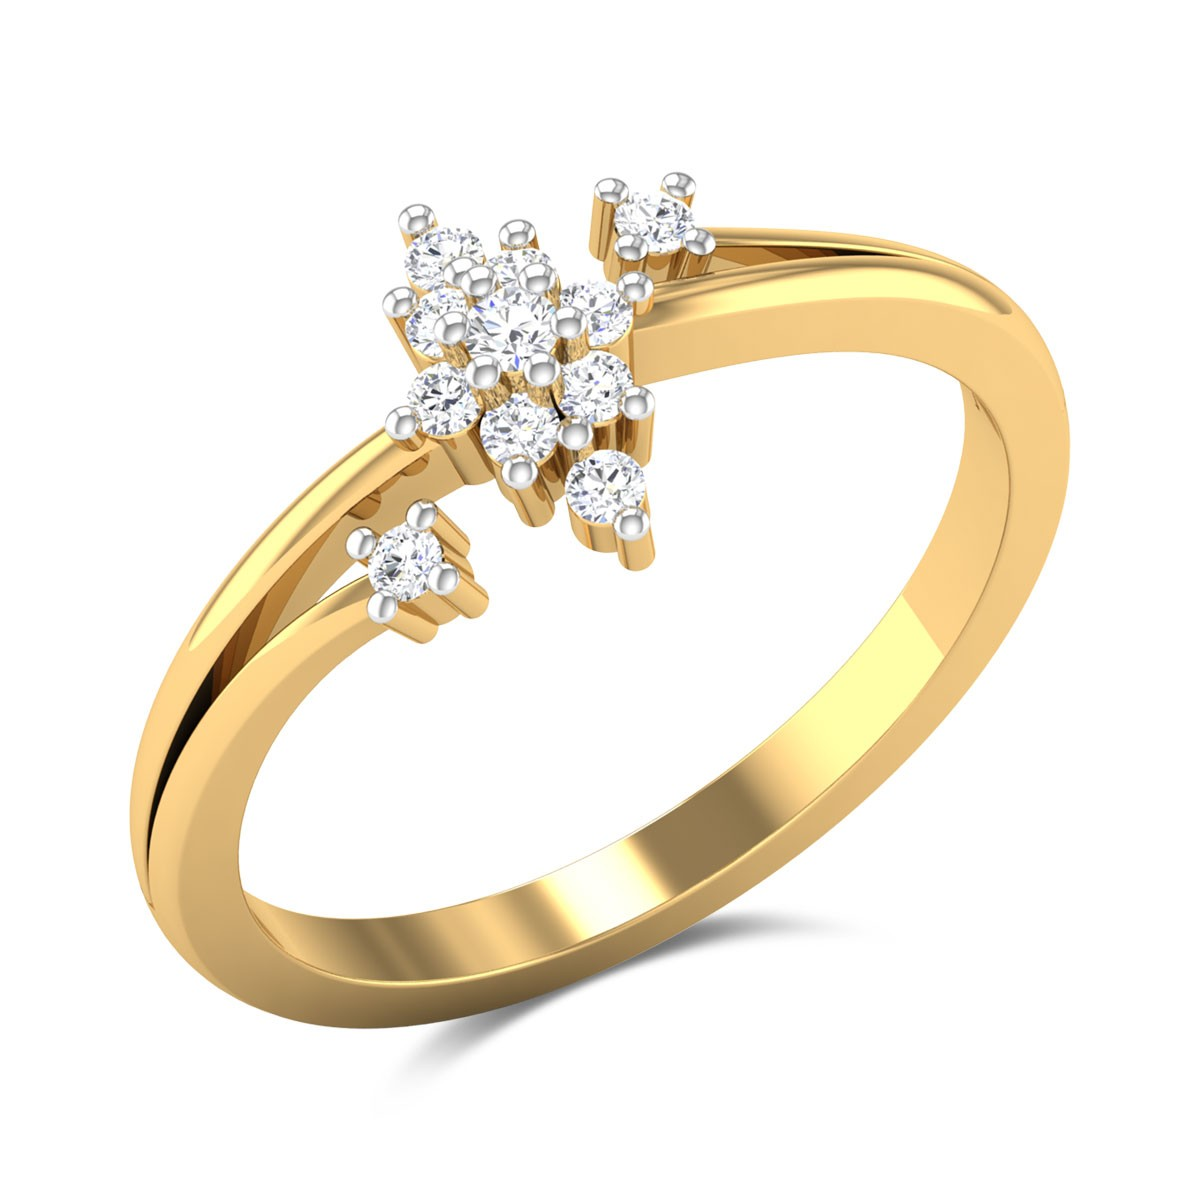 Bali Diamond Ring